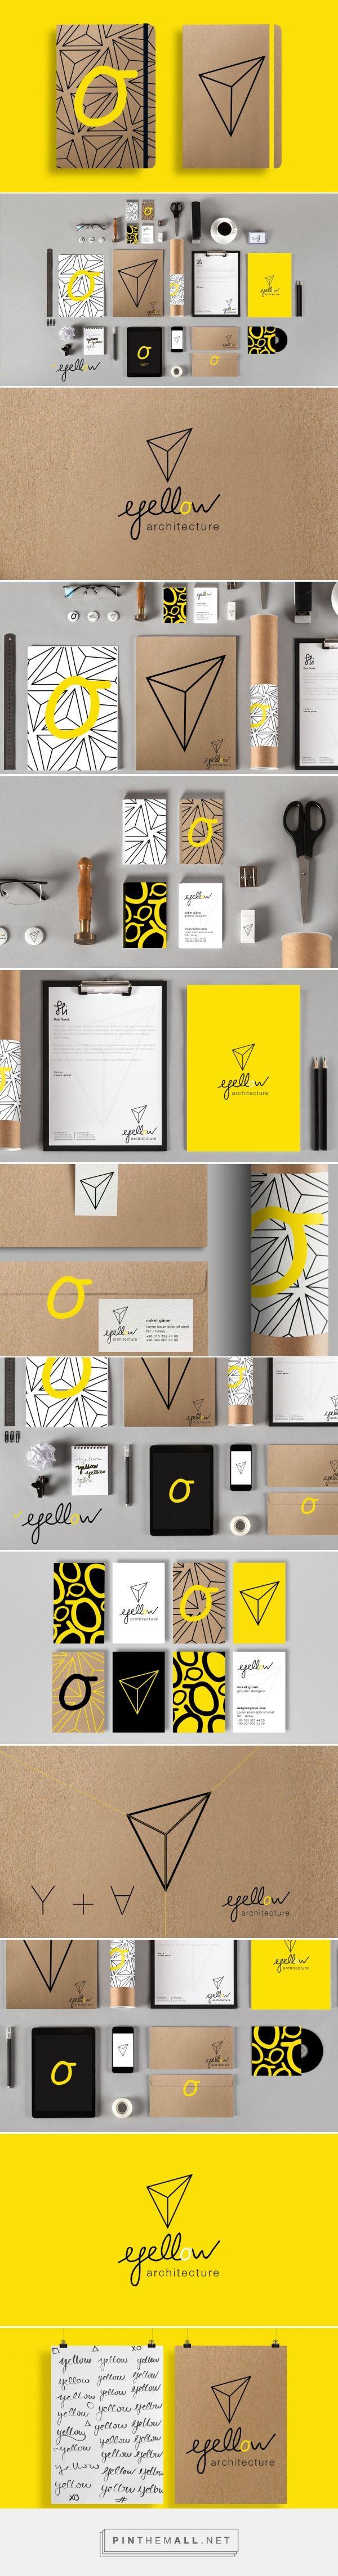 Yellow Architecture Branding by Nuket Guner Corlan | Fivestar Branding – Design and Branding Agency & Inspiration Gallery